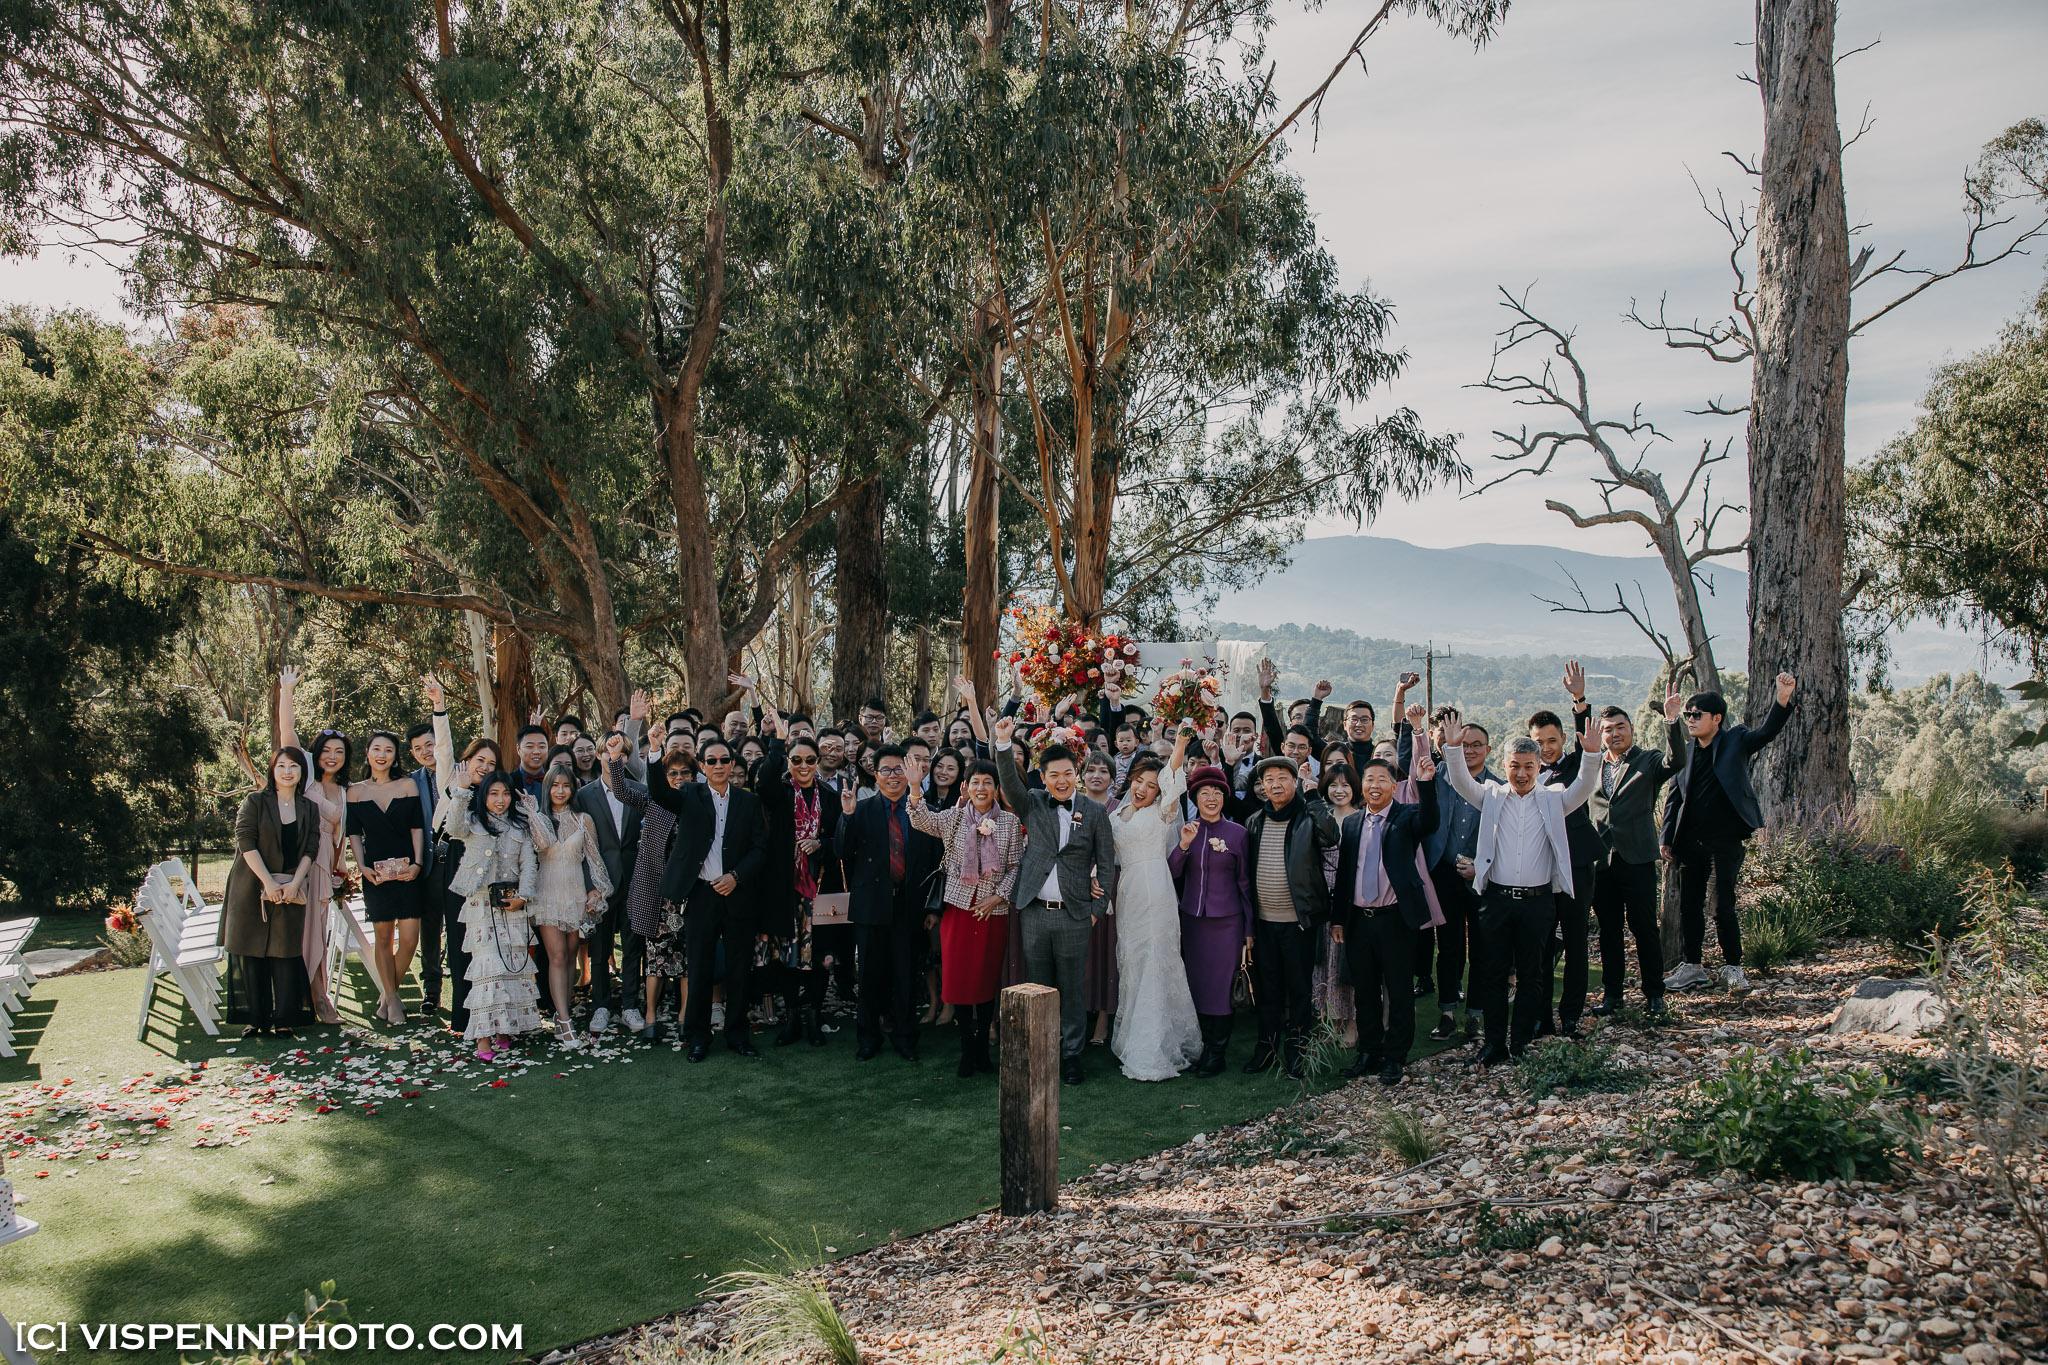 WEDDING DAY Photography Melbourne VISPENN 墨尔本 婚礼跟拍 婚礼摄像 婚礼摄影 结婚照 登记照 DominicHelen 1P 2876 EOSR VISPENN